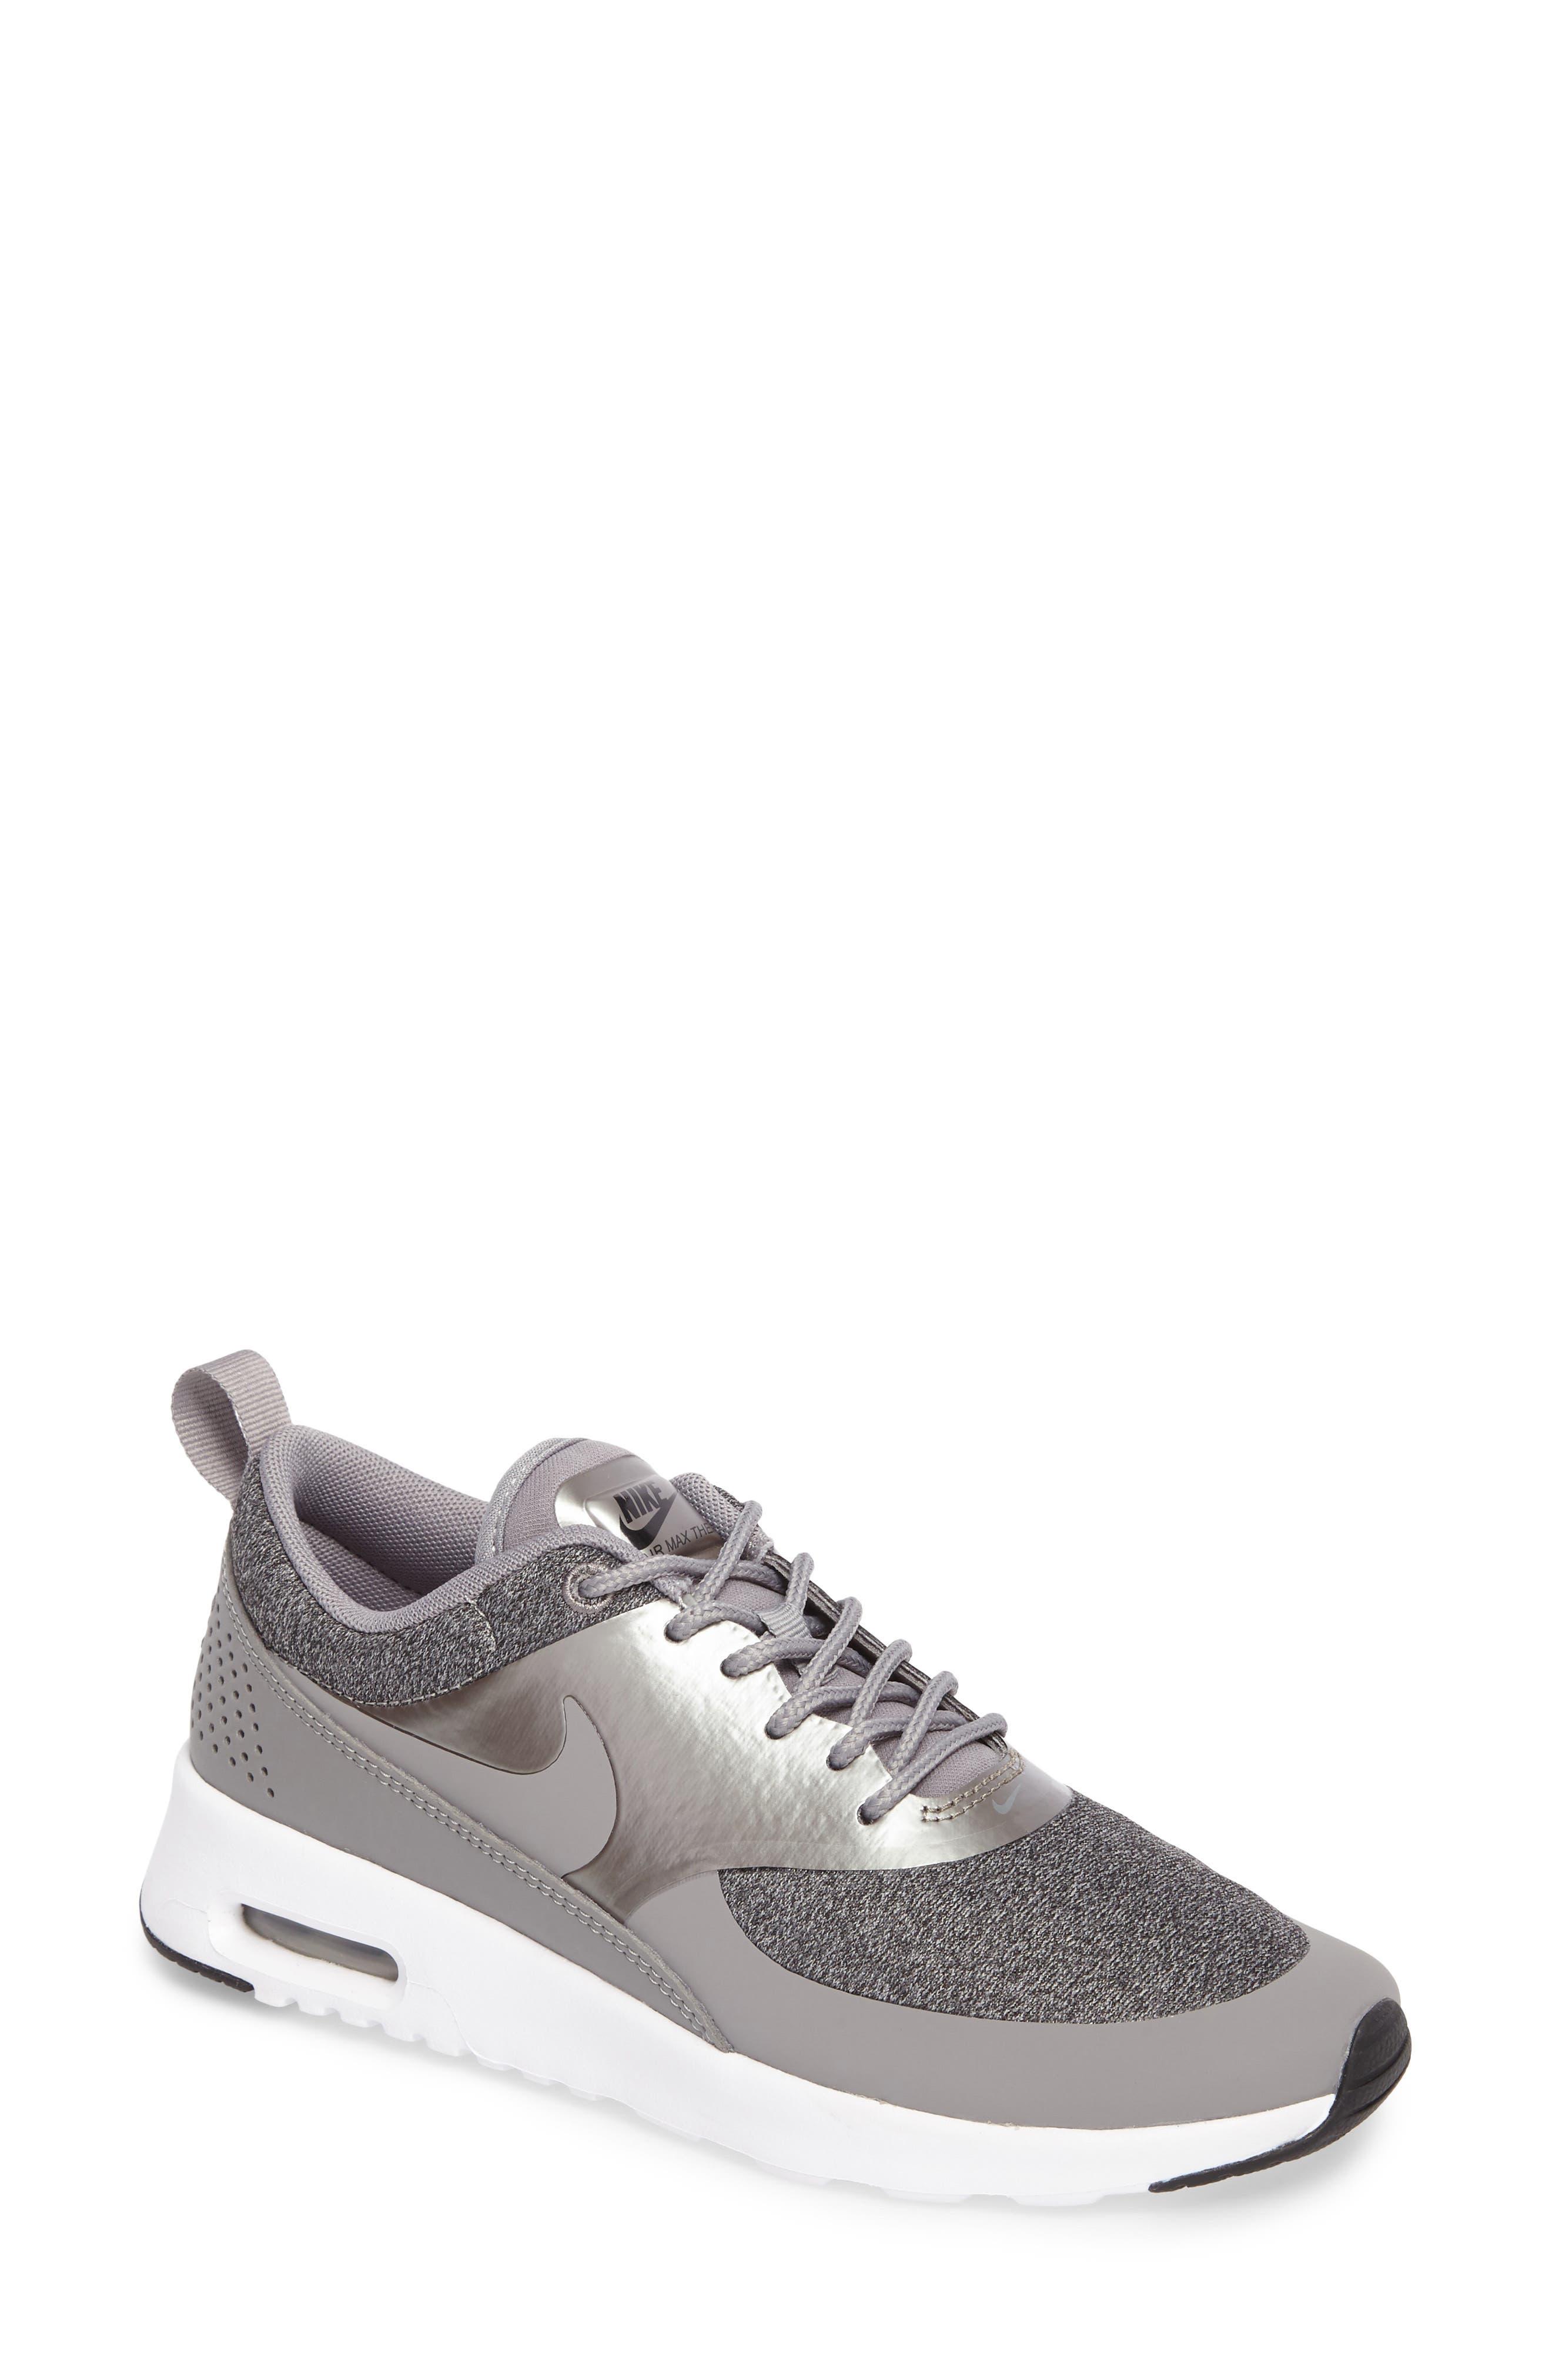 Air Max Thea Knit Sneaker,                         Main,                         color, 020